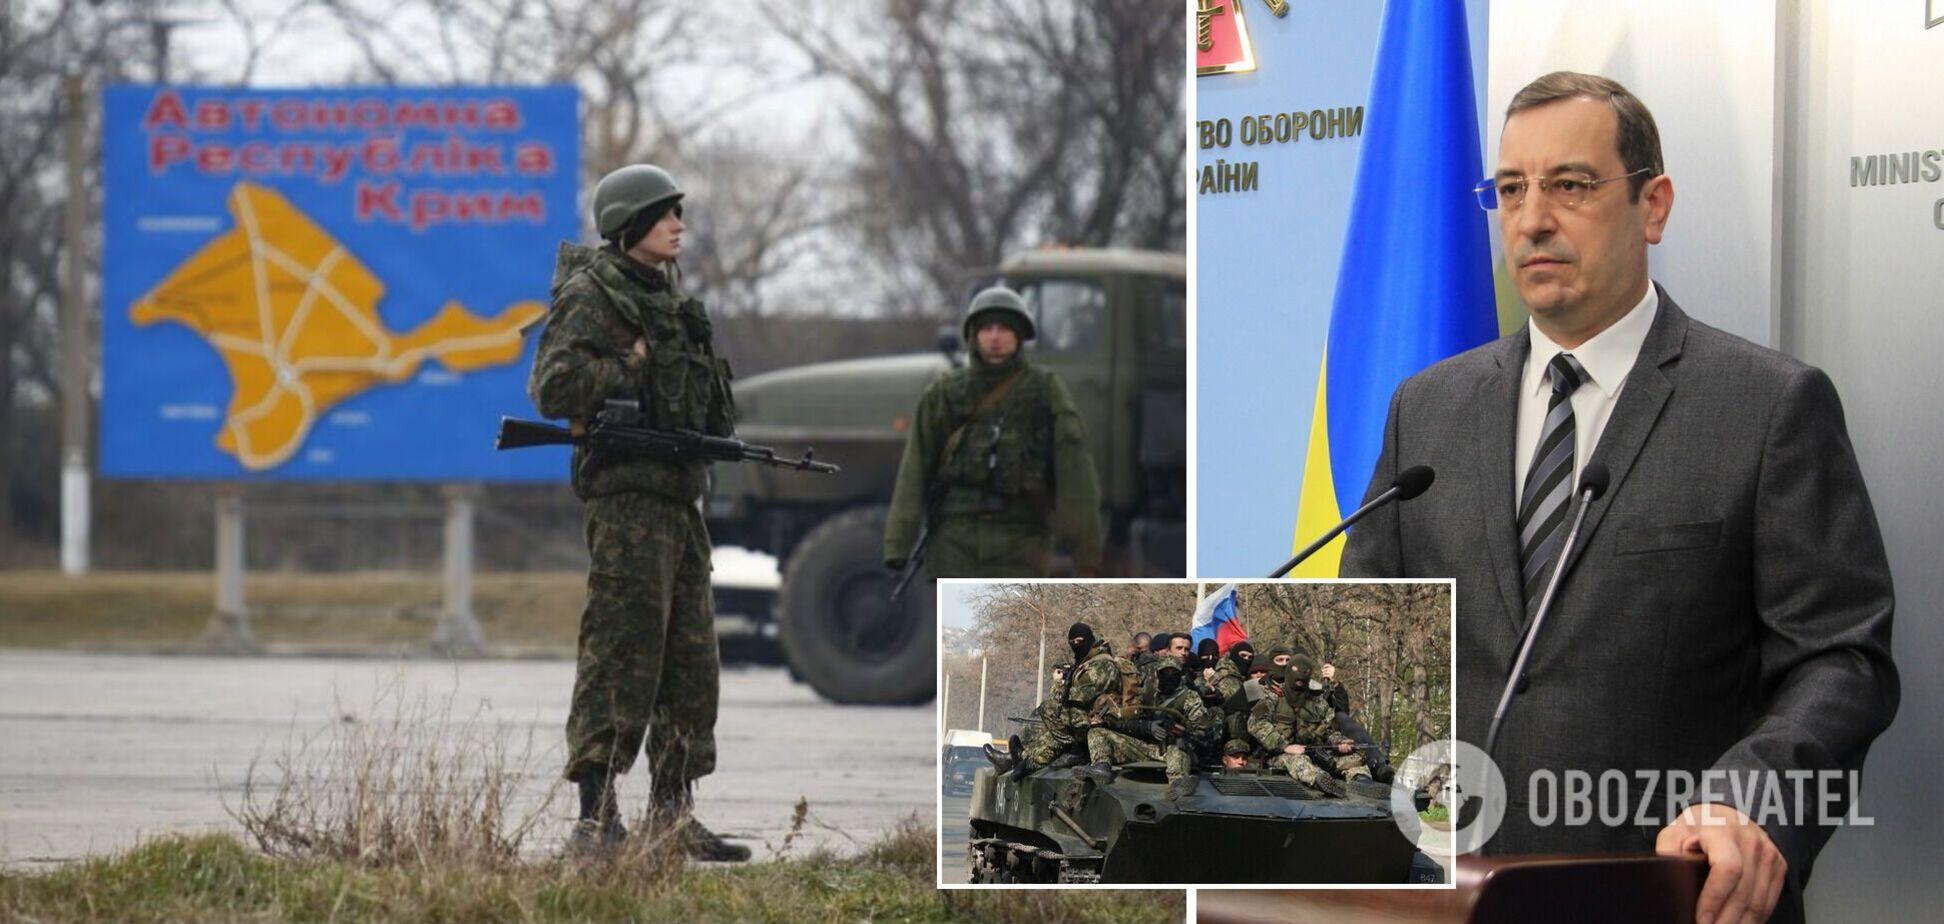 Россия отрабатывала захват Донбасса на учениях с Беларусью в 2013 году – разведка